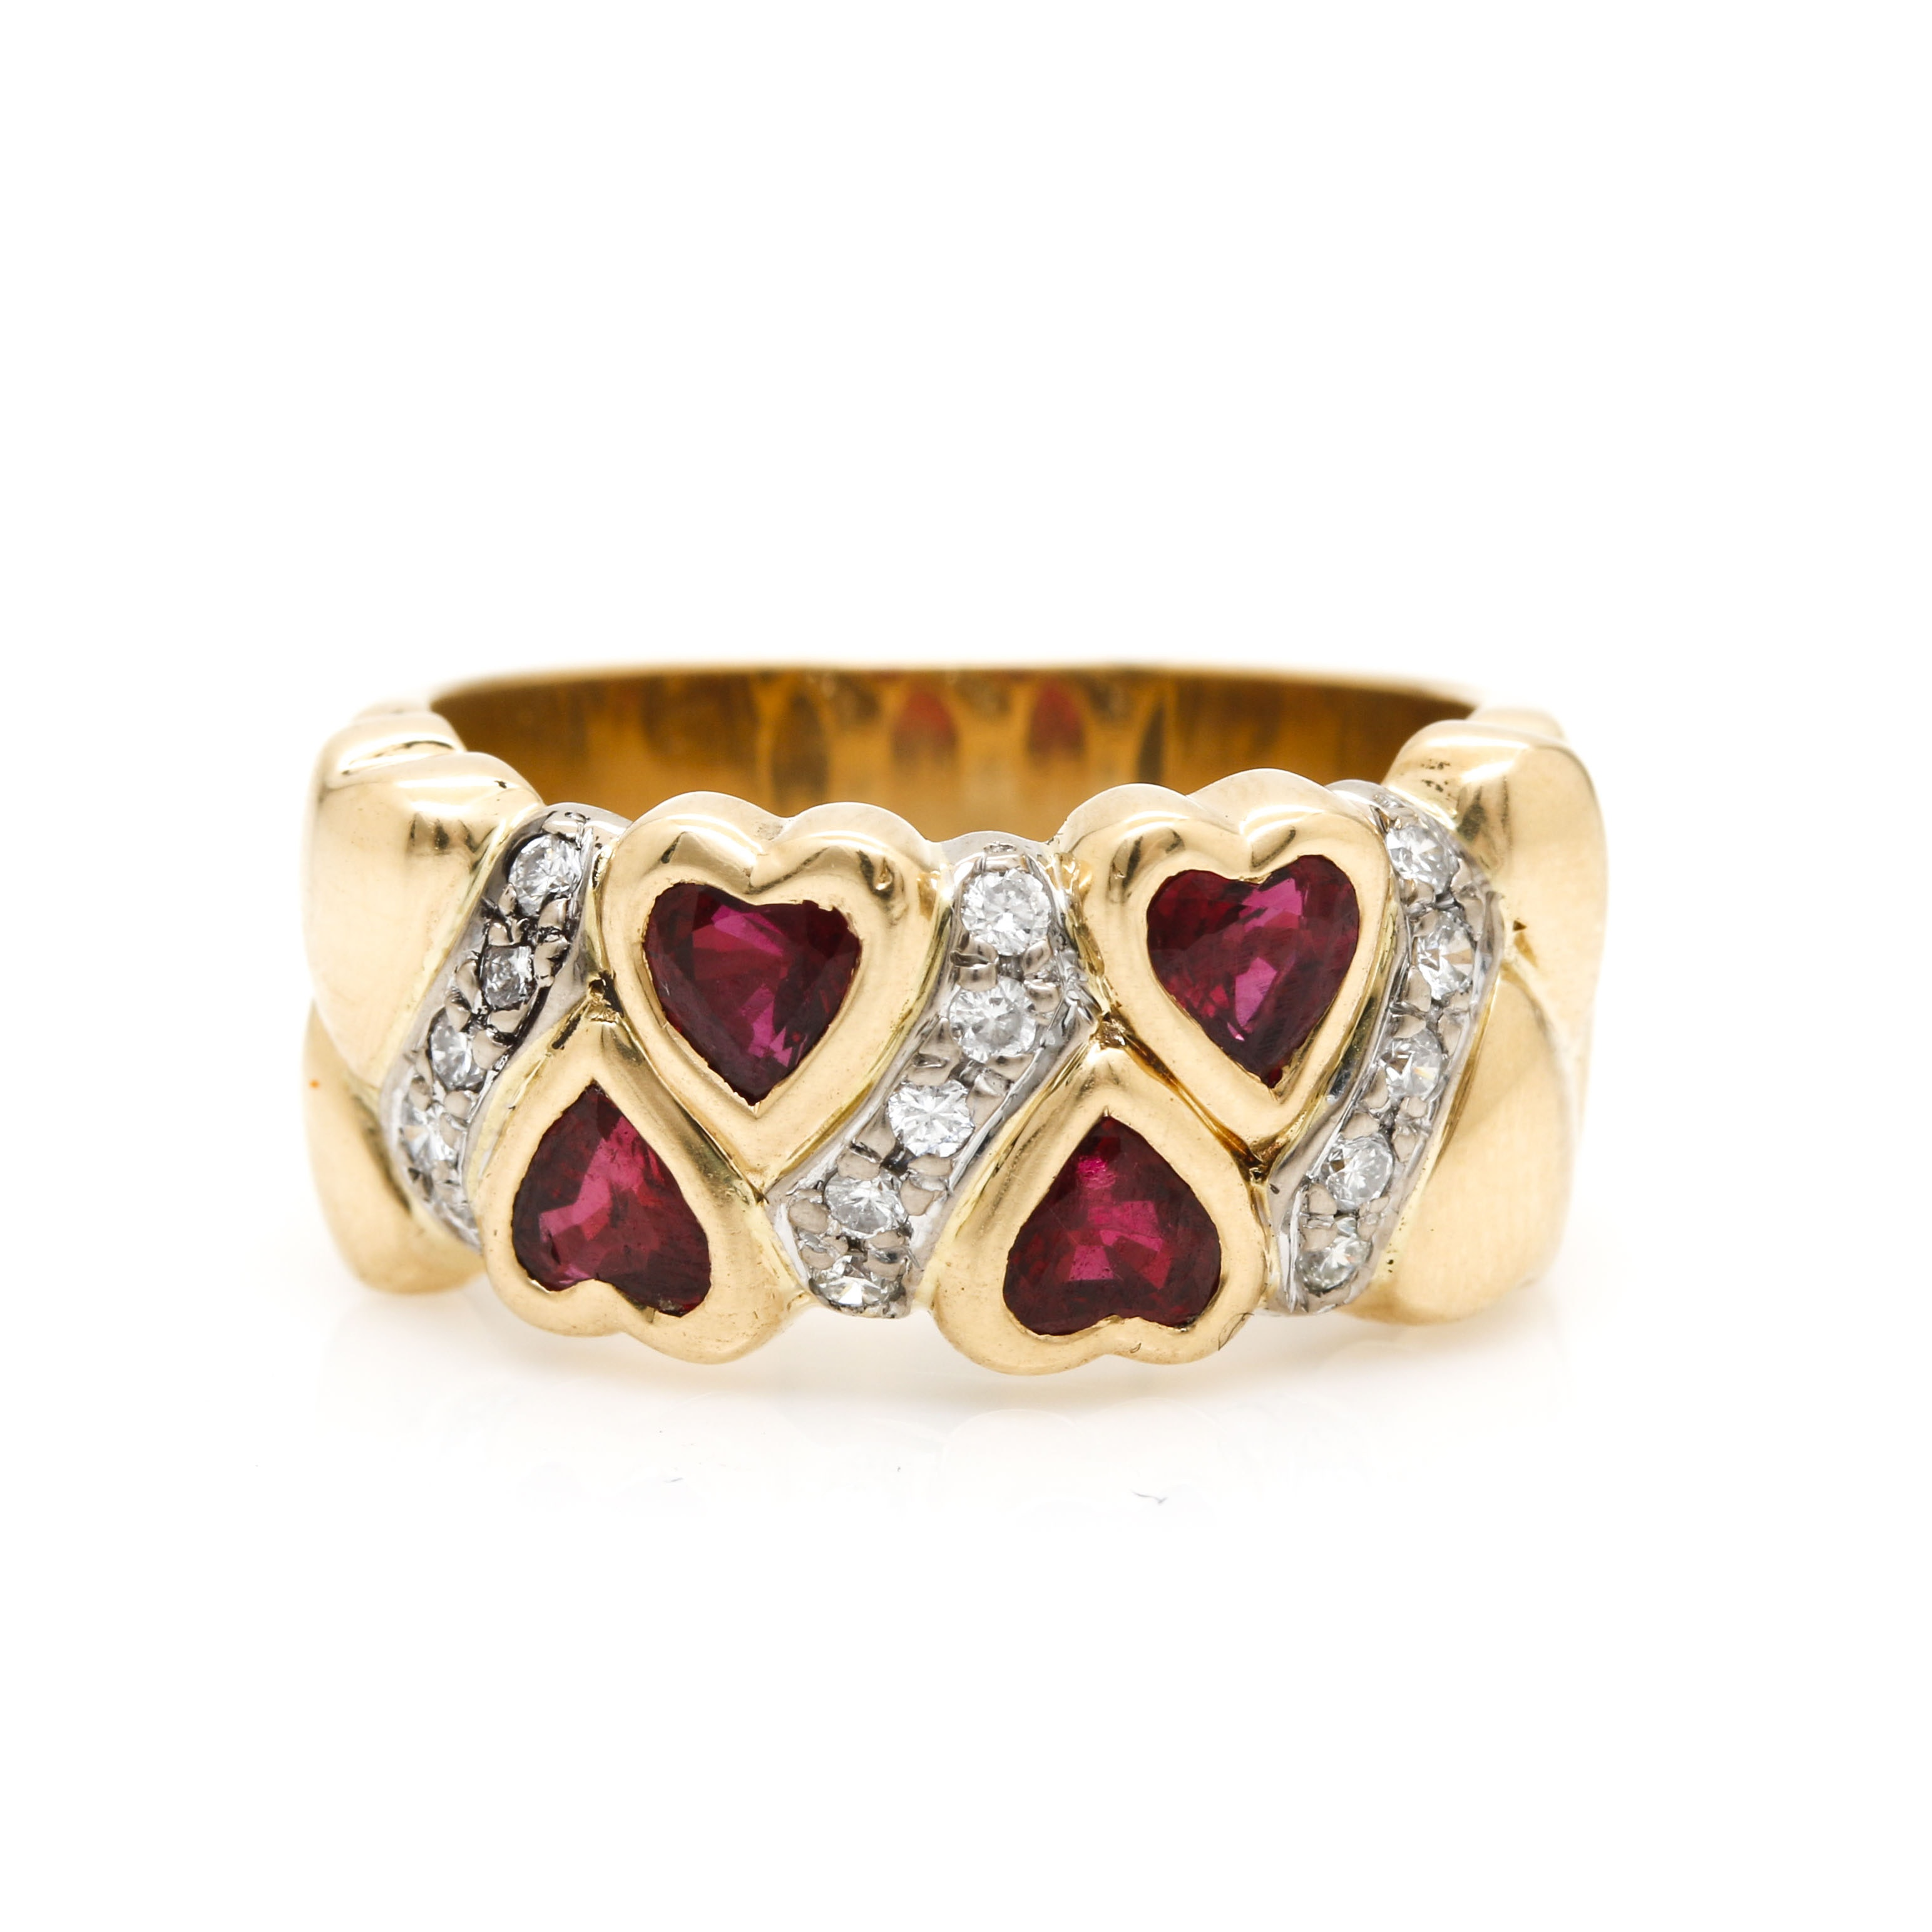 18K Yellow Gold Ruby and Diamond Heart Ring EBTH